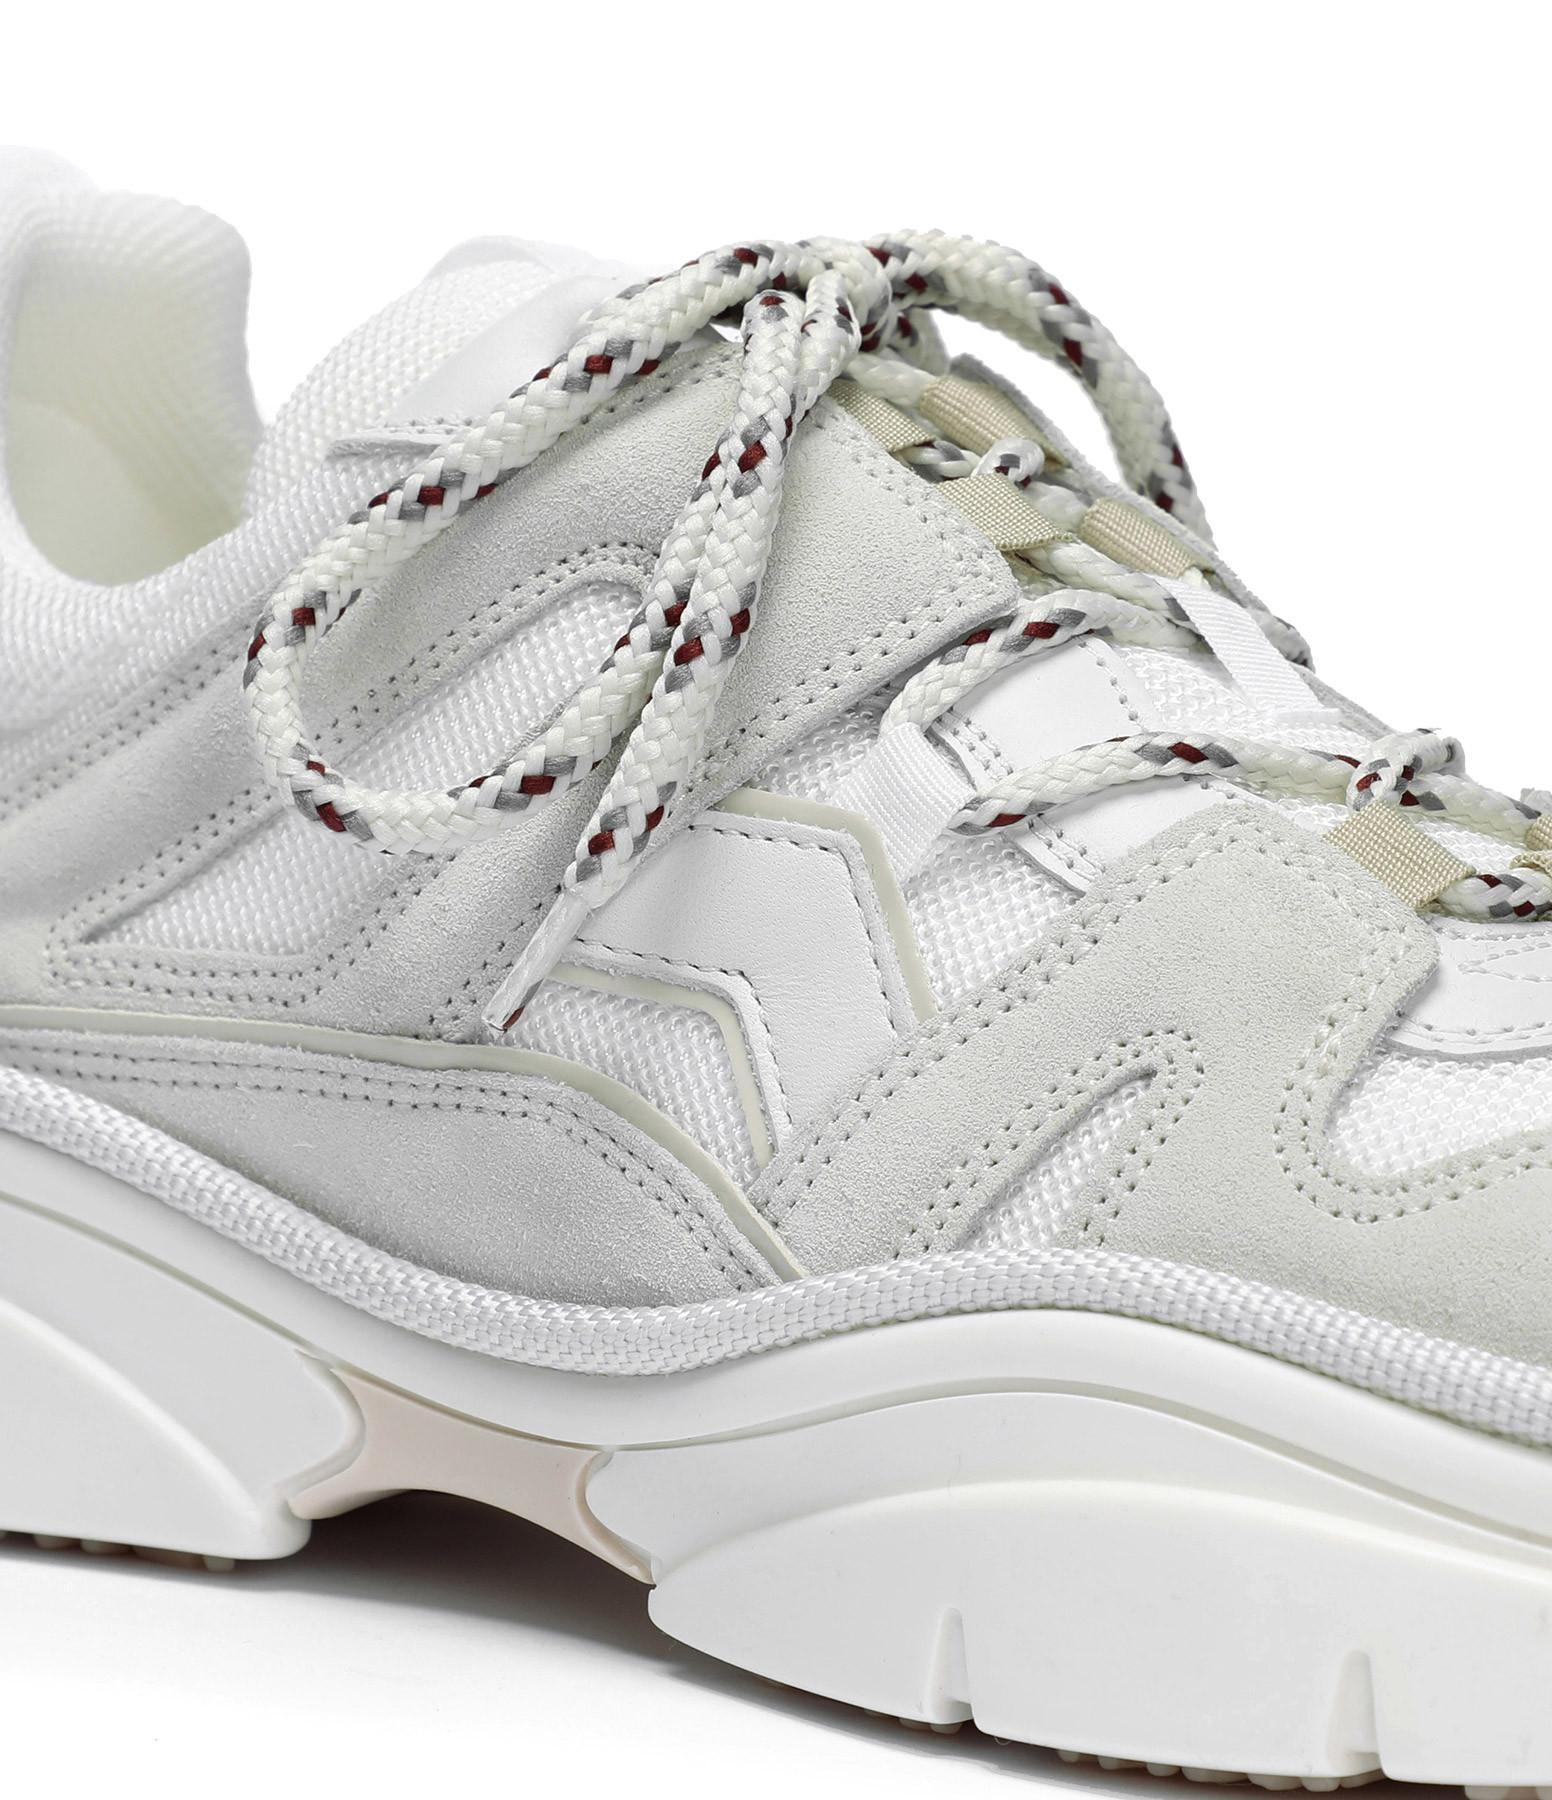 ISABEL MARANT - Baskets Kindsay Cuir Blanc Craie